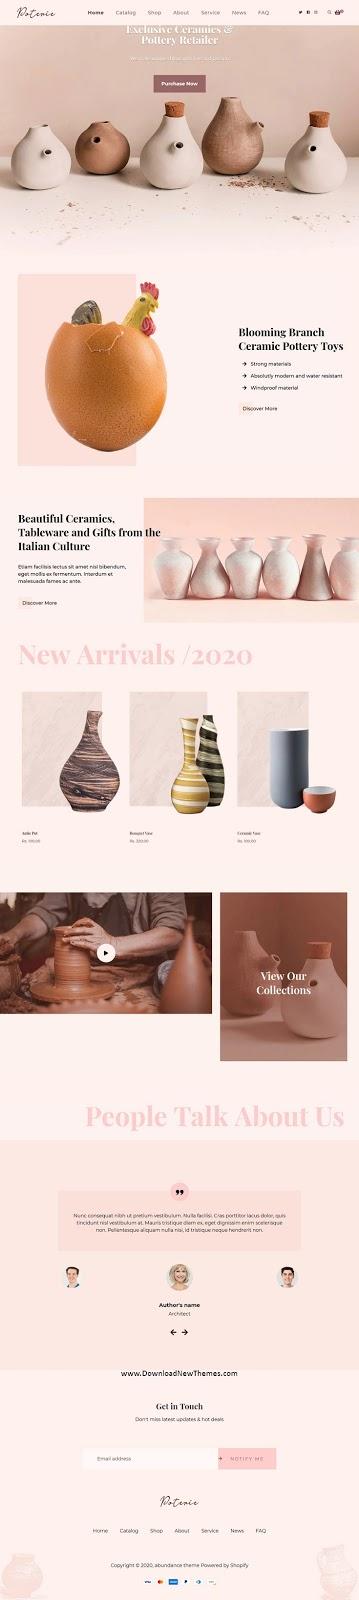 Handmade Ceramic Shop eCommerce Theme